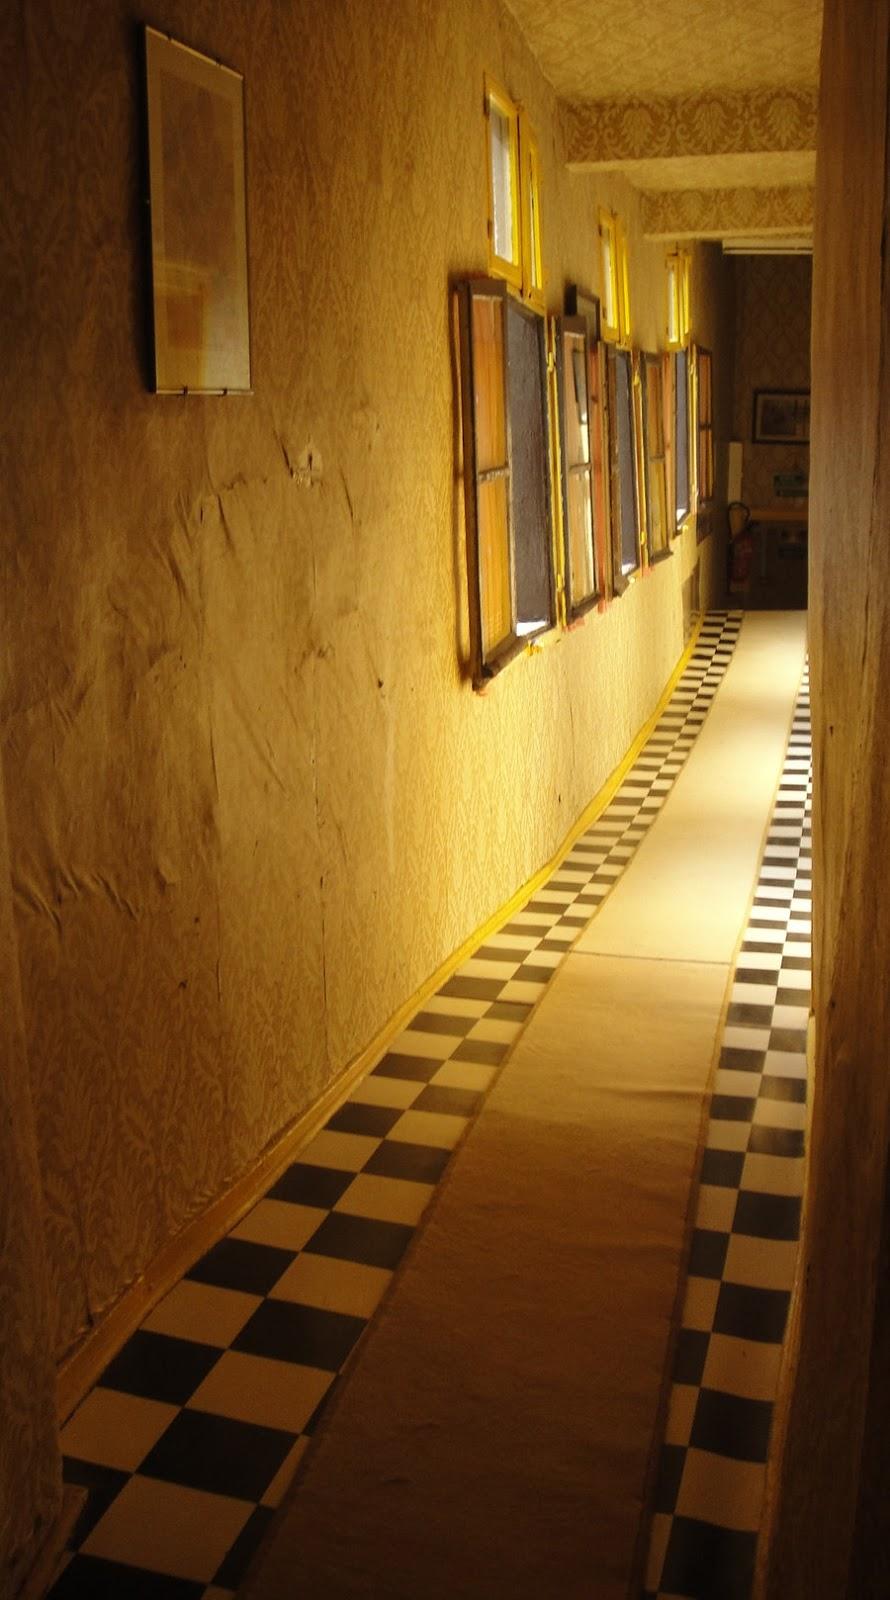 creepy hostel by mt 000 d4ee9mi